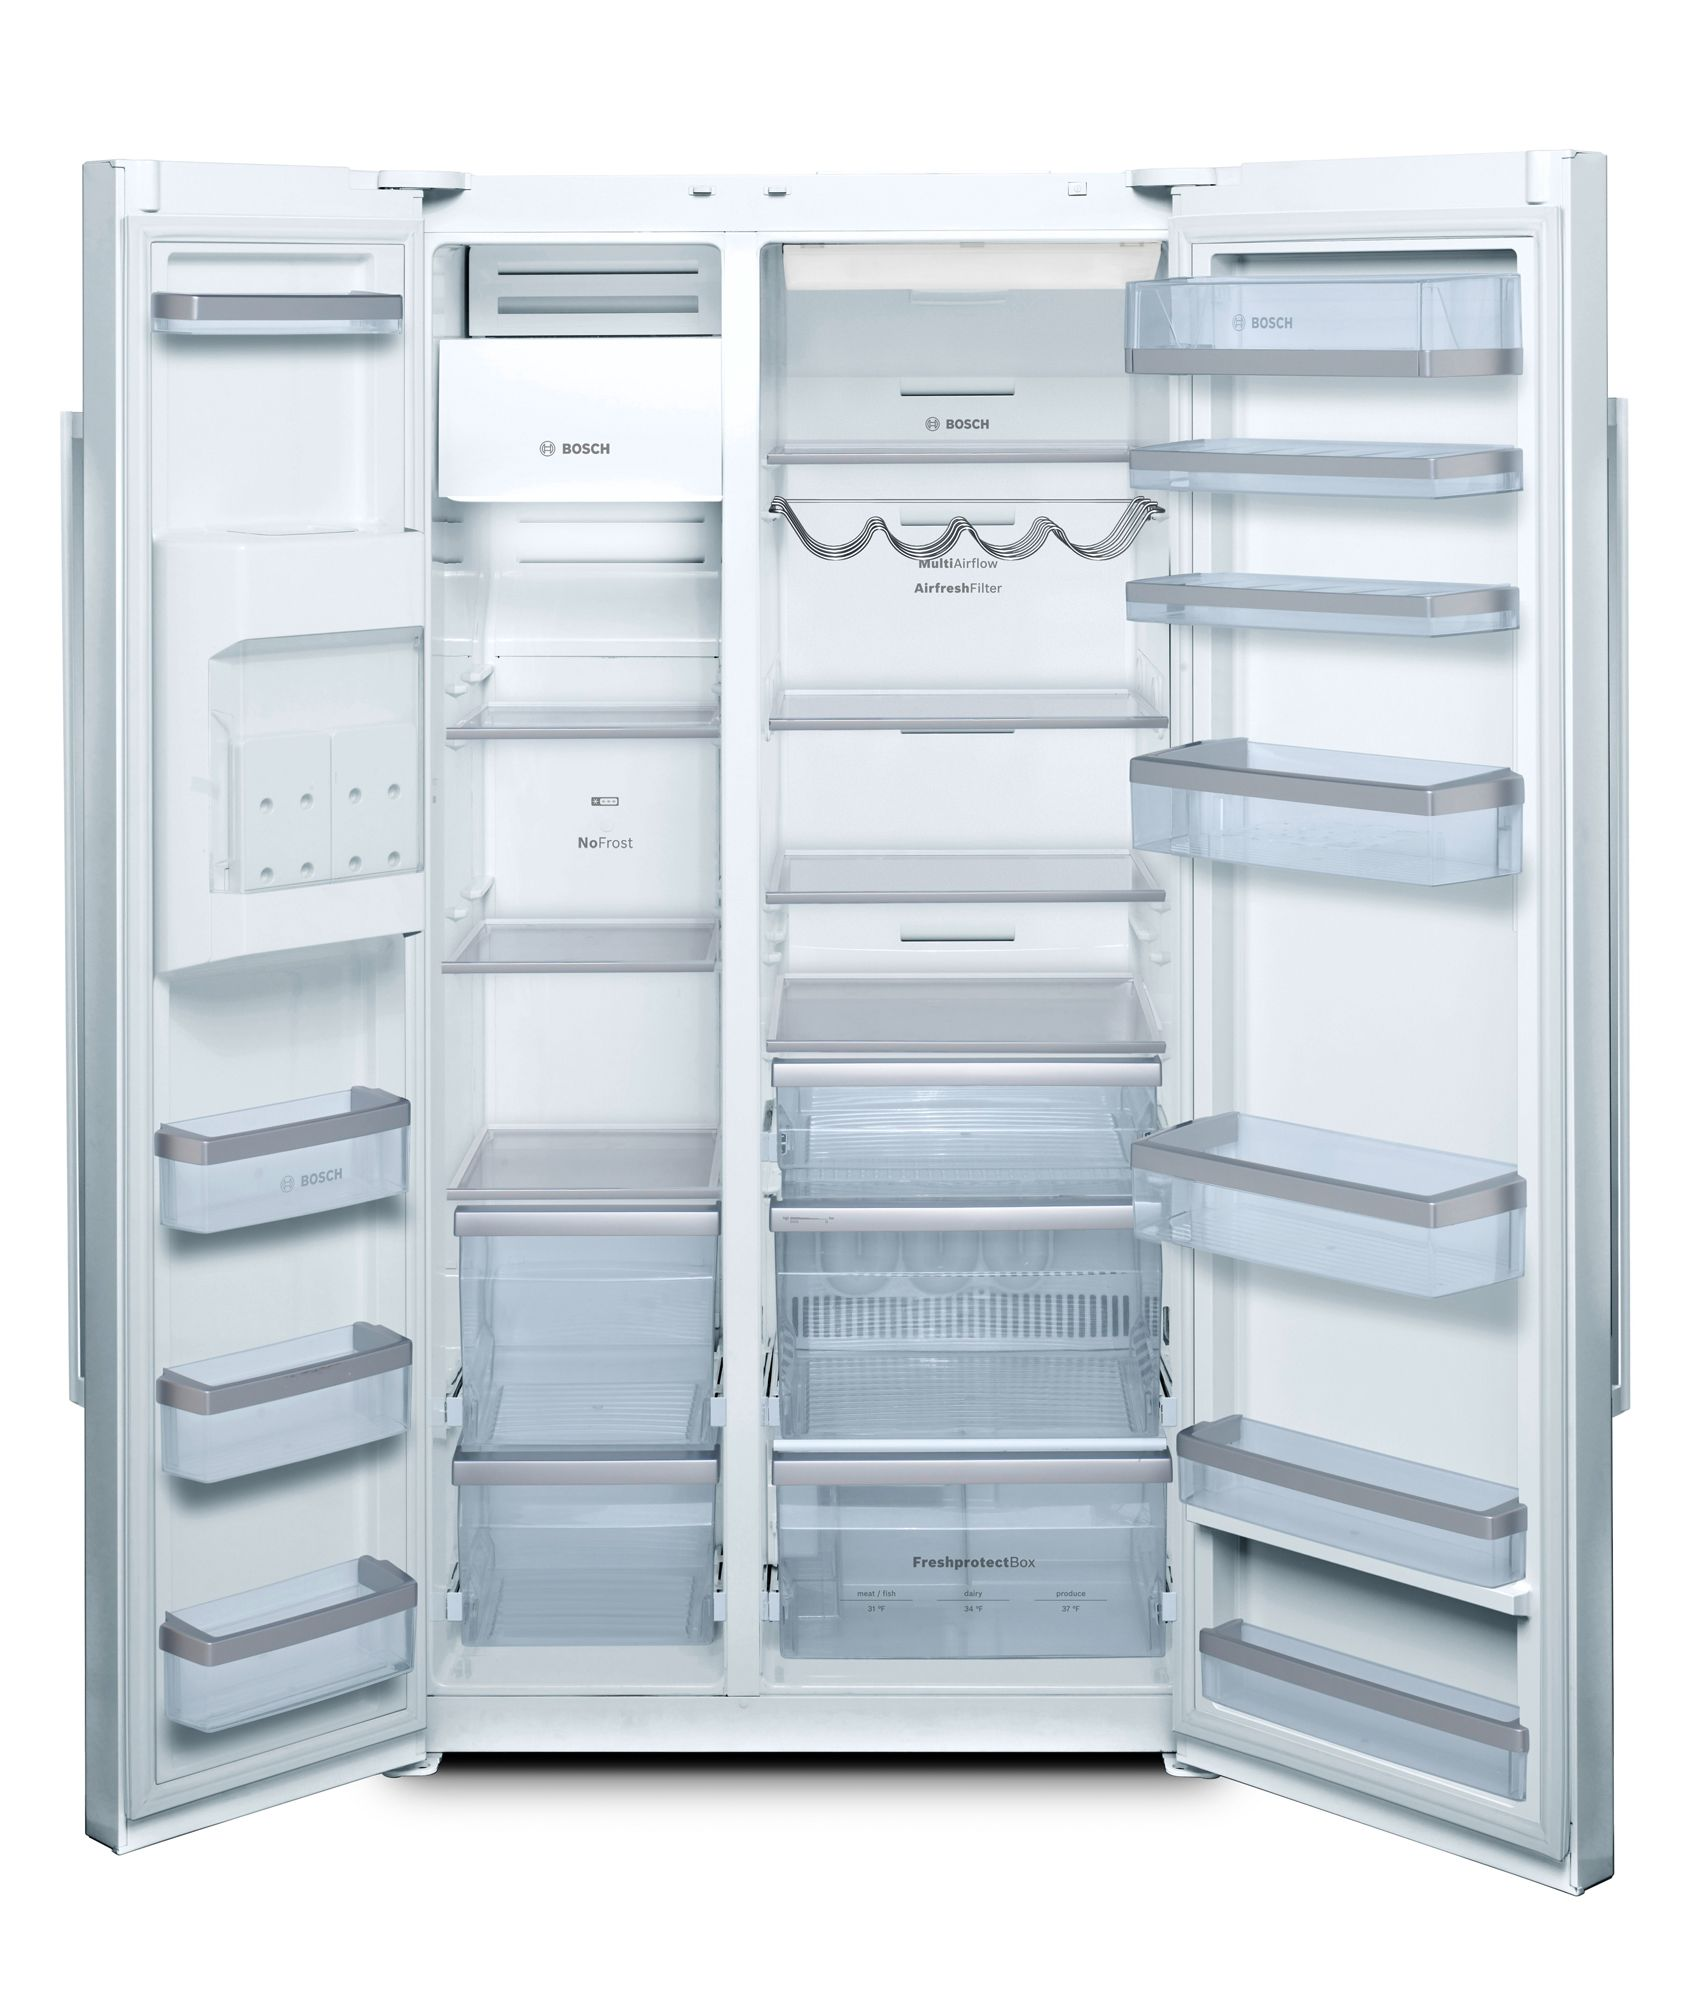 Bosch 21.7 cu. ft. Linea Counter-Depth Side-By-Side Refrigerator